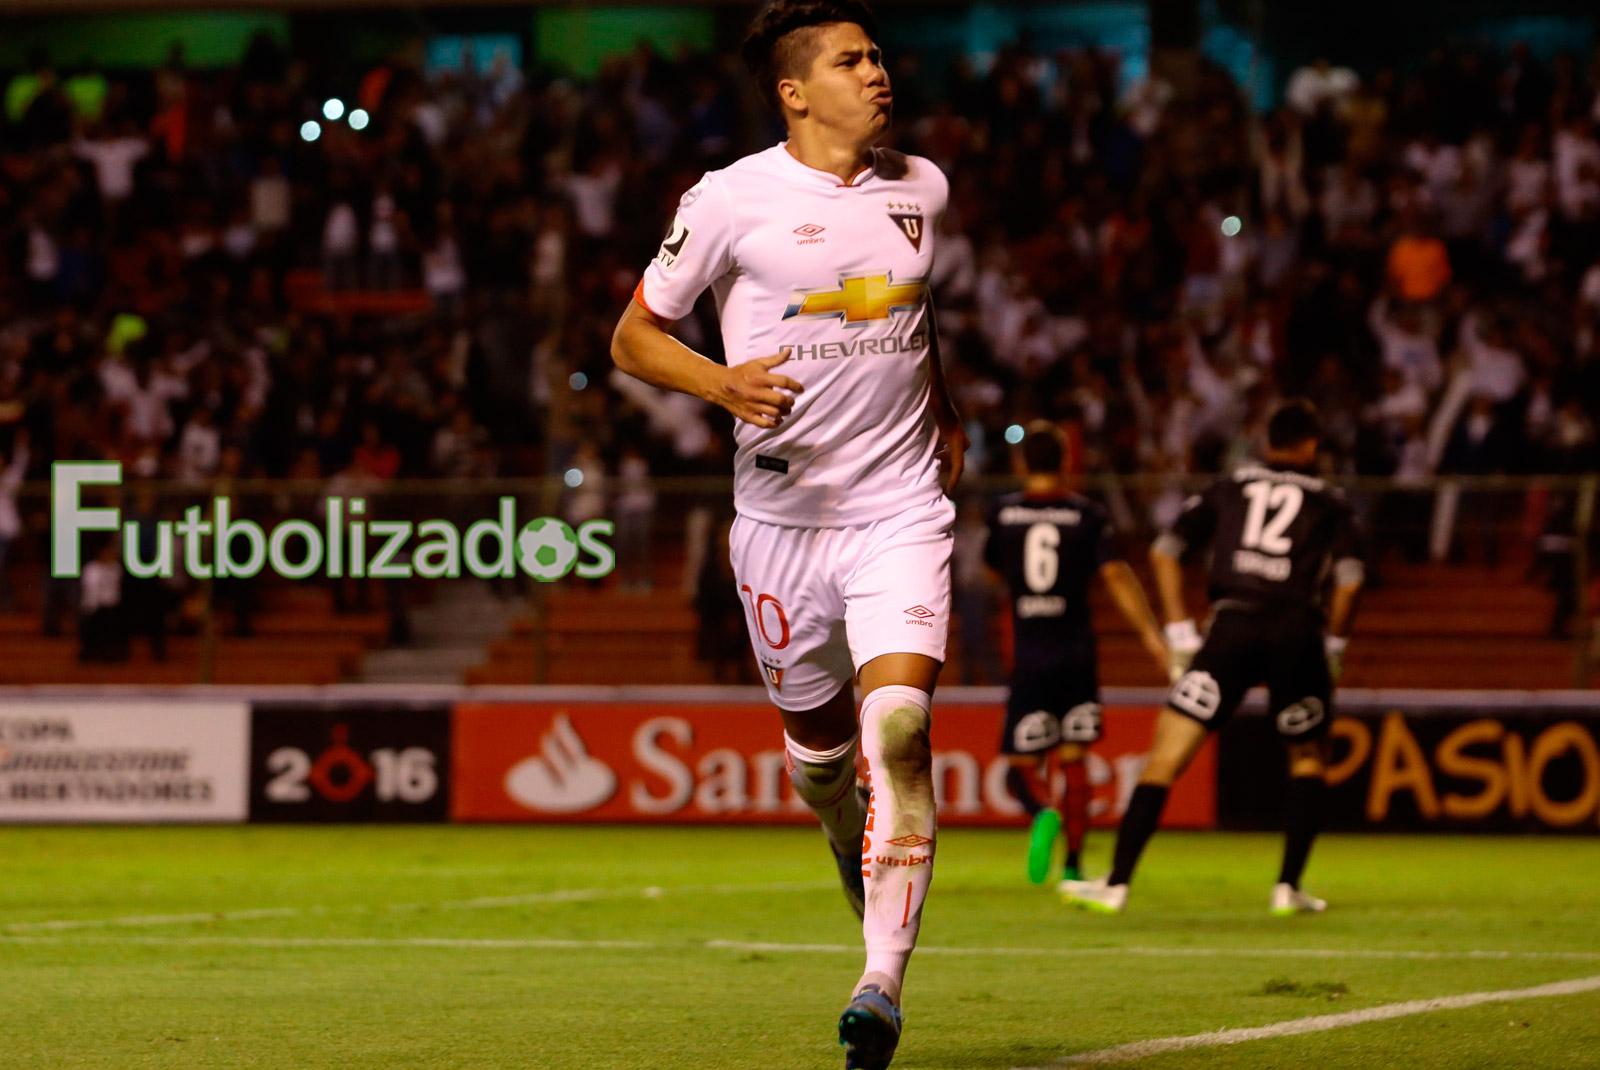 ligaquito_celebracion_sanlorenzo_diego_morales_01